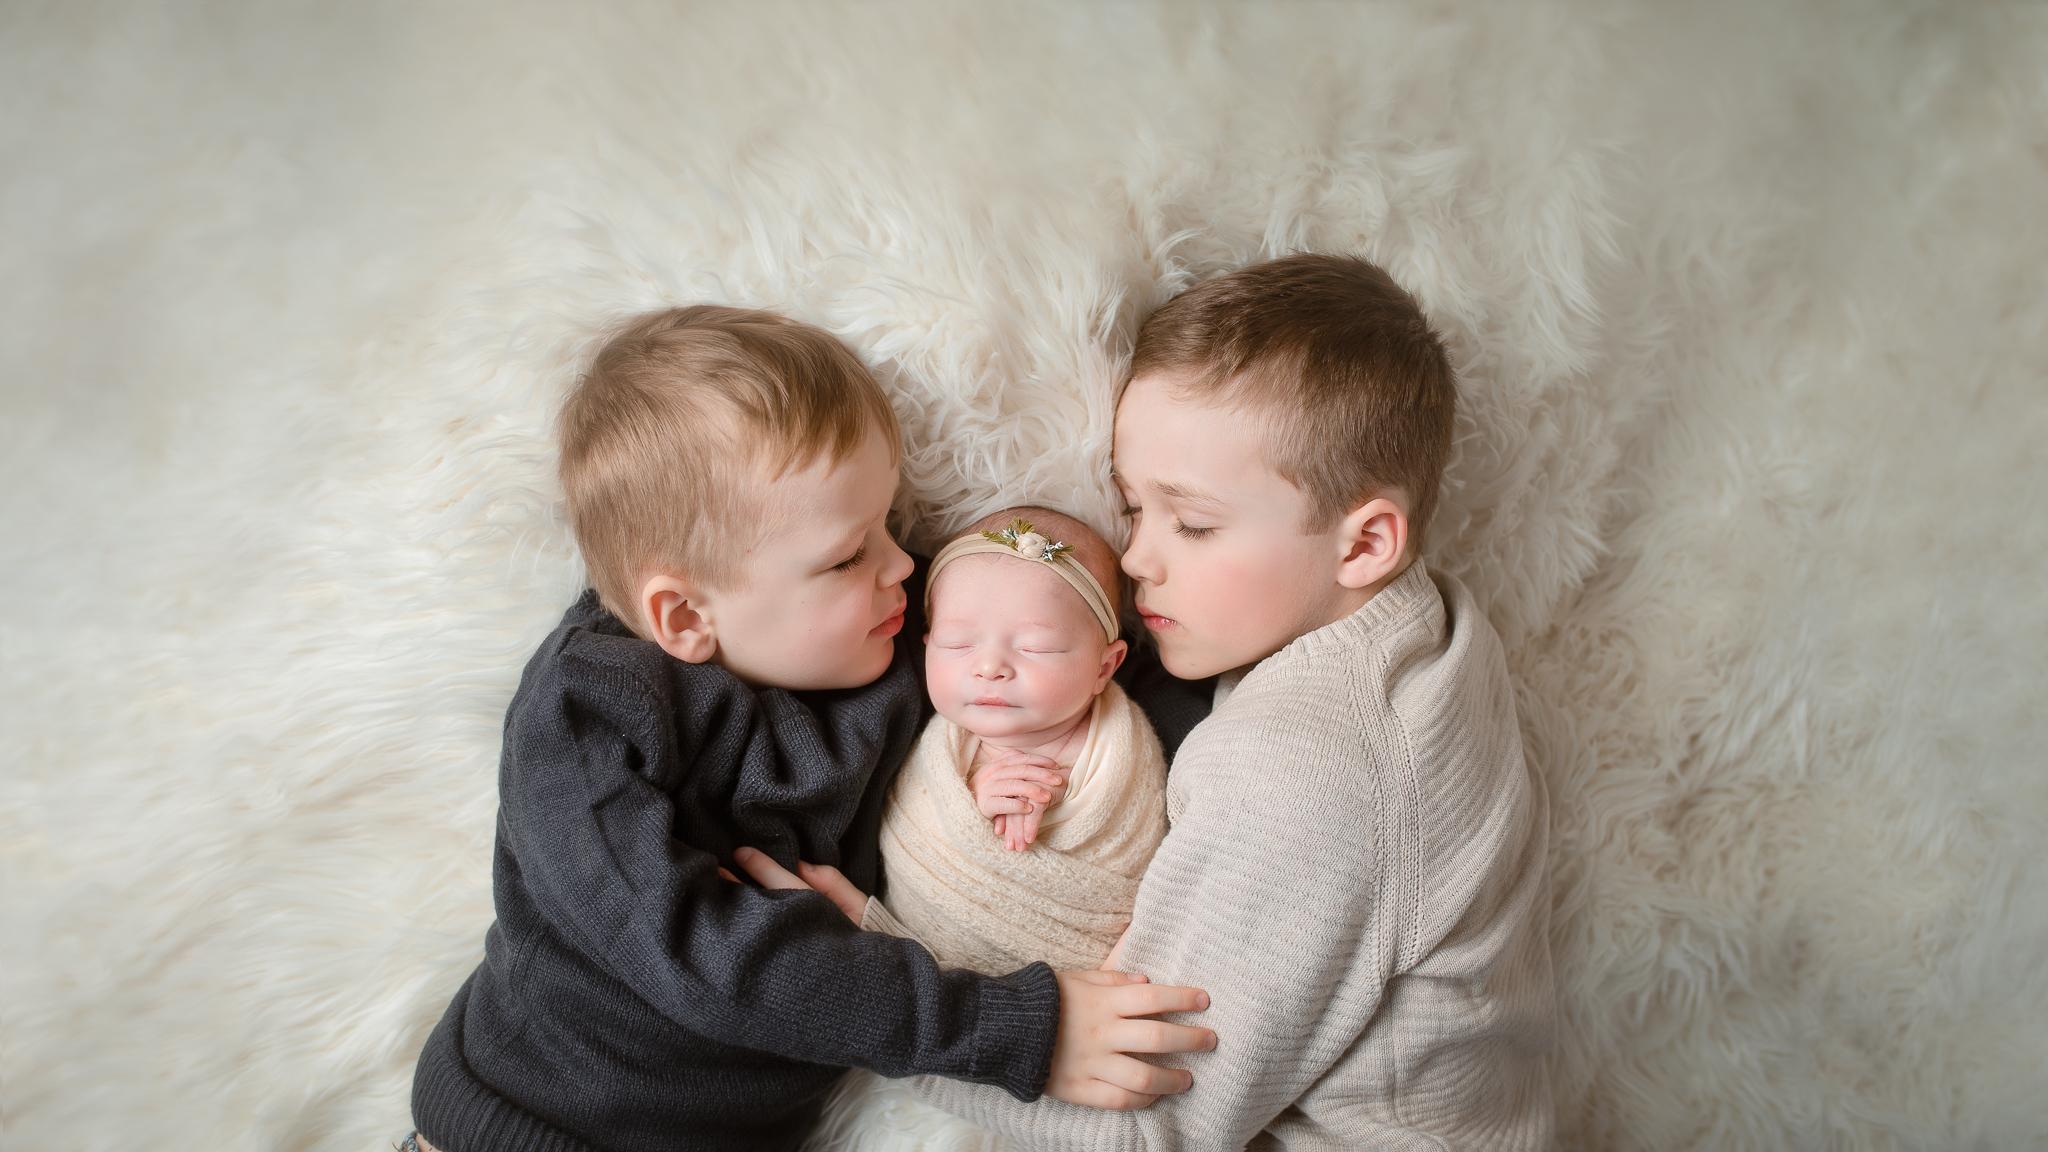 Newborn155NaomiLuciennePhotography032019-Edit-2.jpg